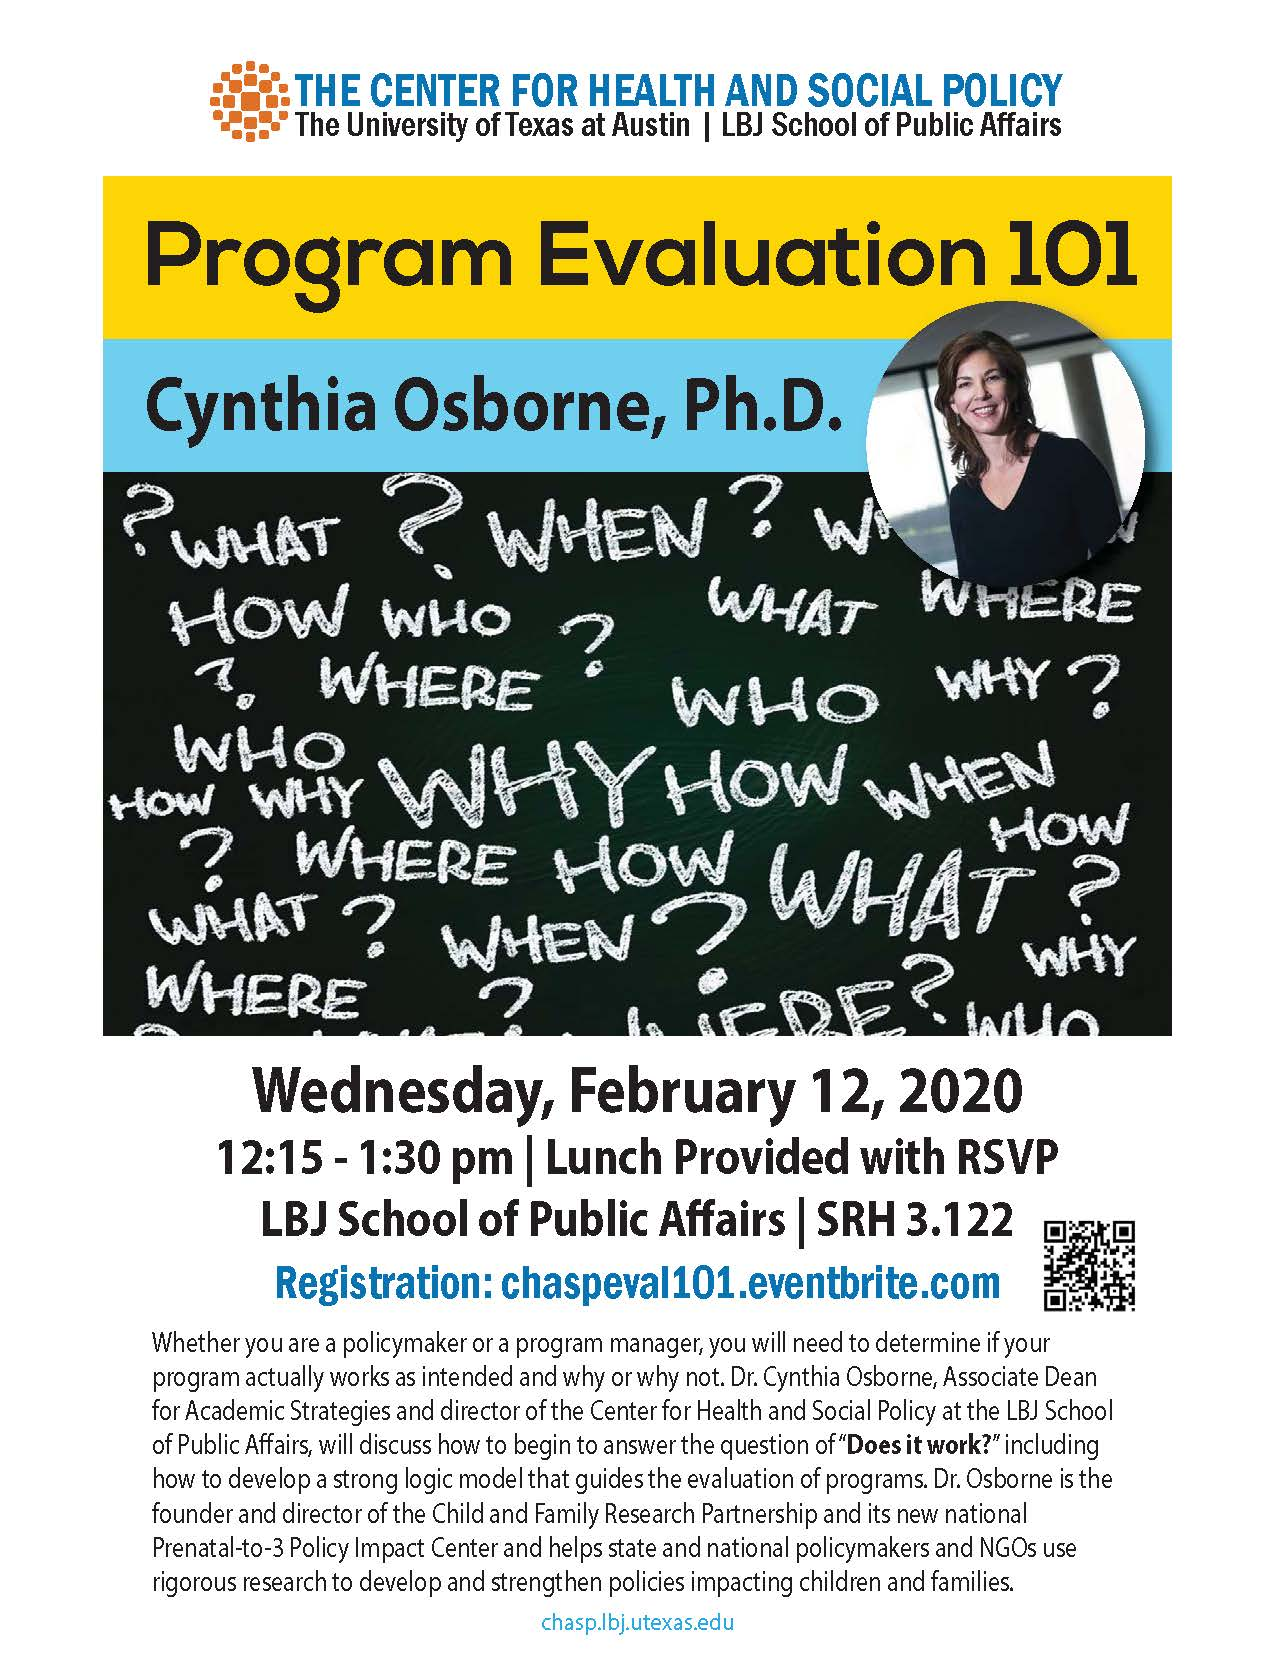 Poster of Program Eval 101